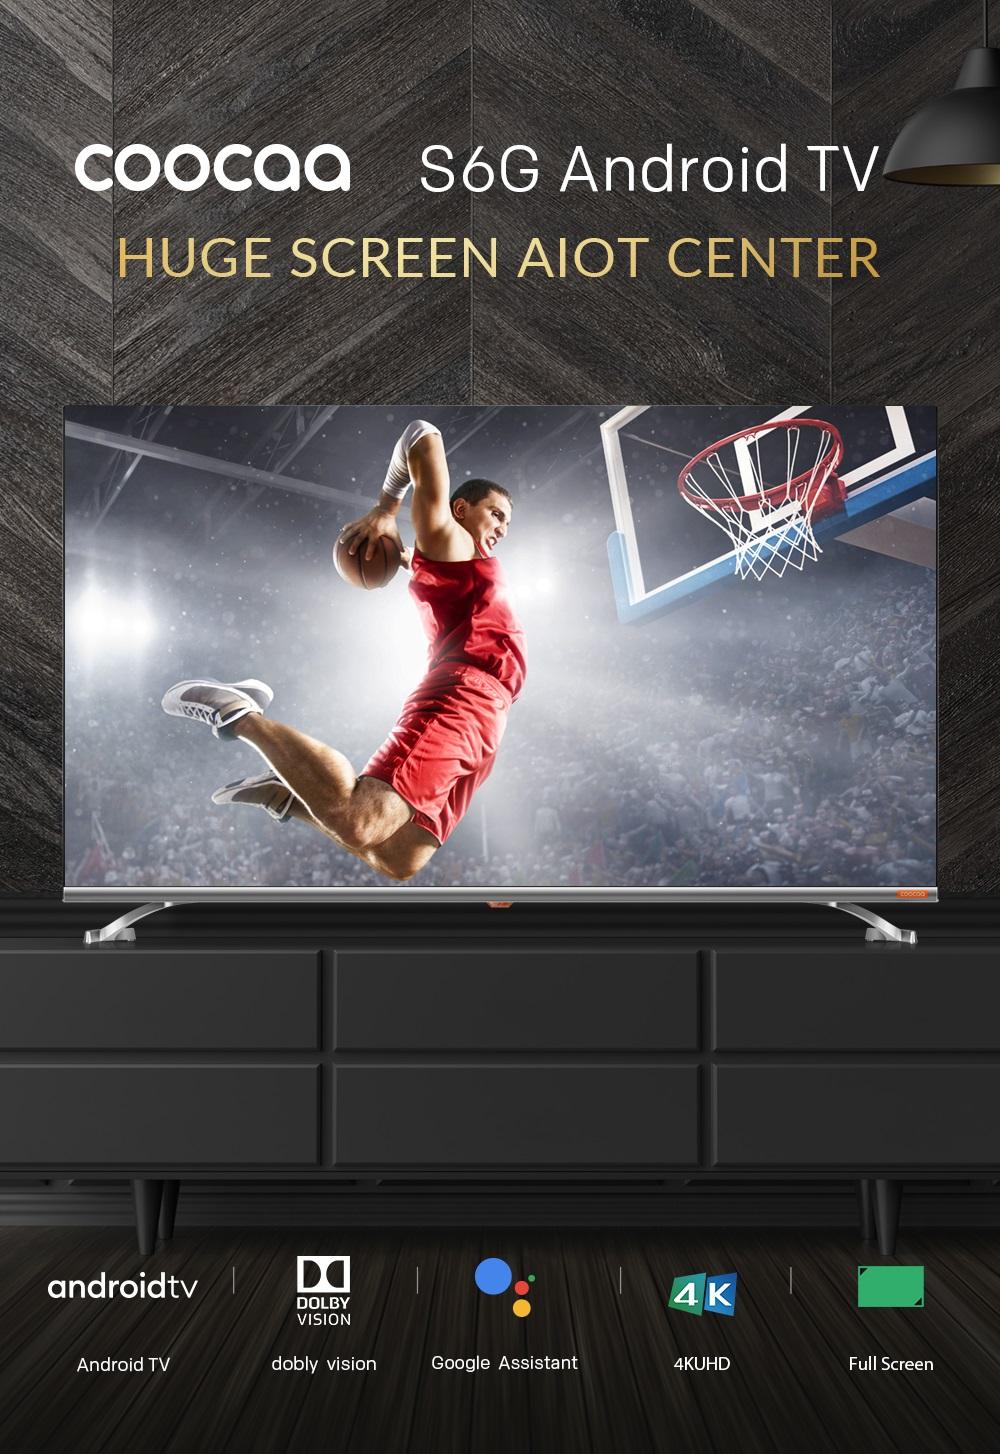 COOCAA Tops Best-seller List of Smart TVs on Lazada Ramadan Sale